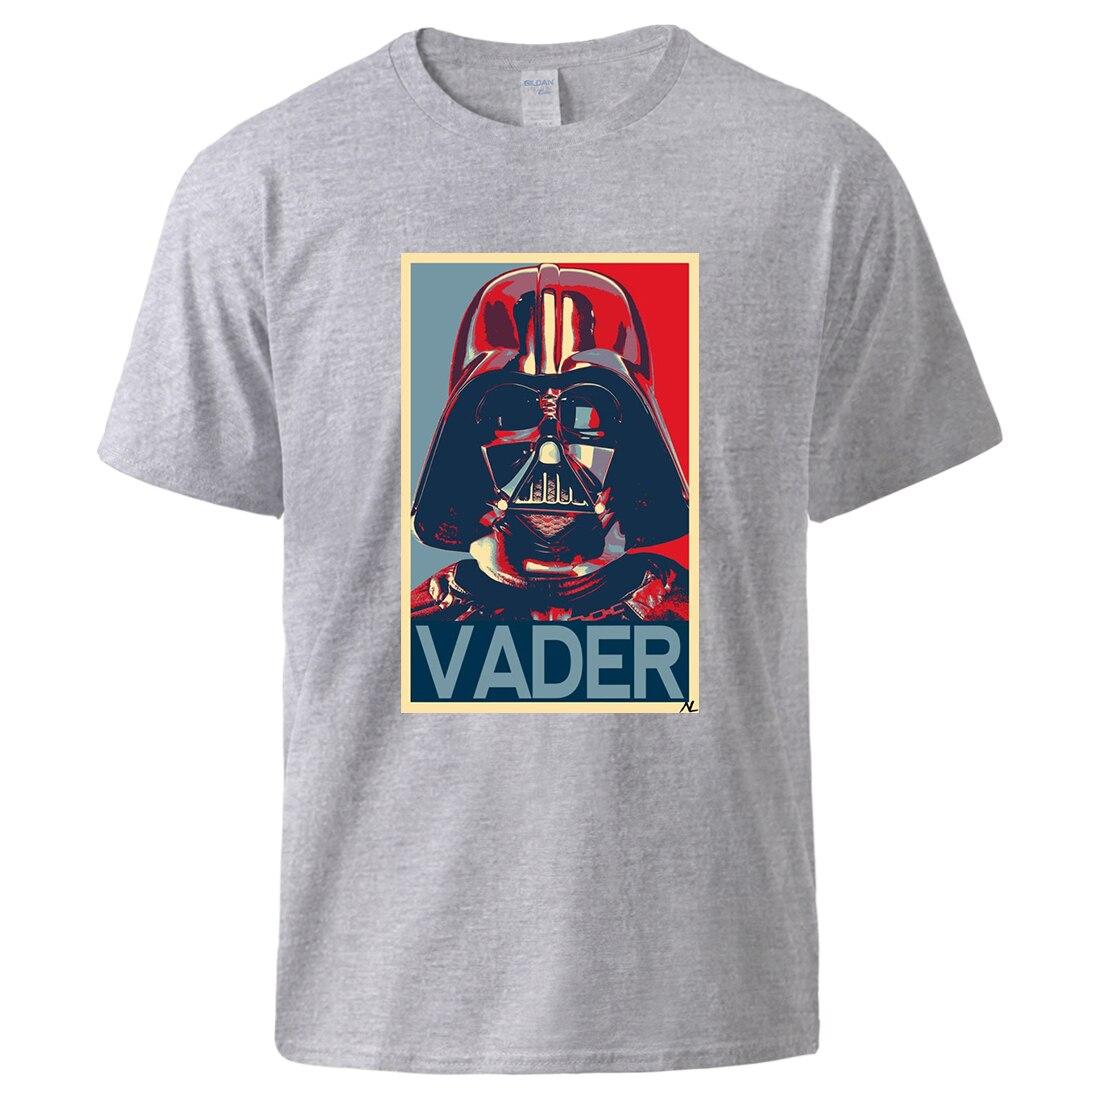 Starwars Darth Vader Tshirts Summer Short Sleeve Cotton Sportswear Star Wars Fashion Tshirt Tee 2020 Male Loose Workout Top Plus